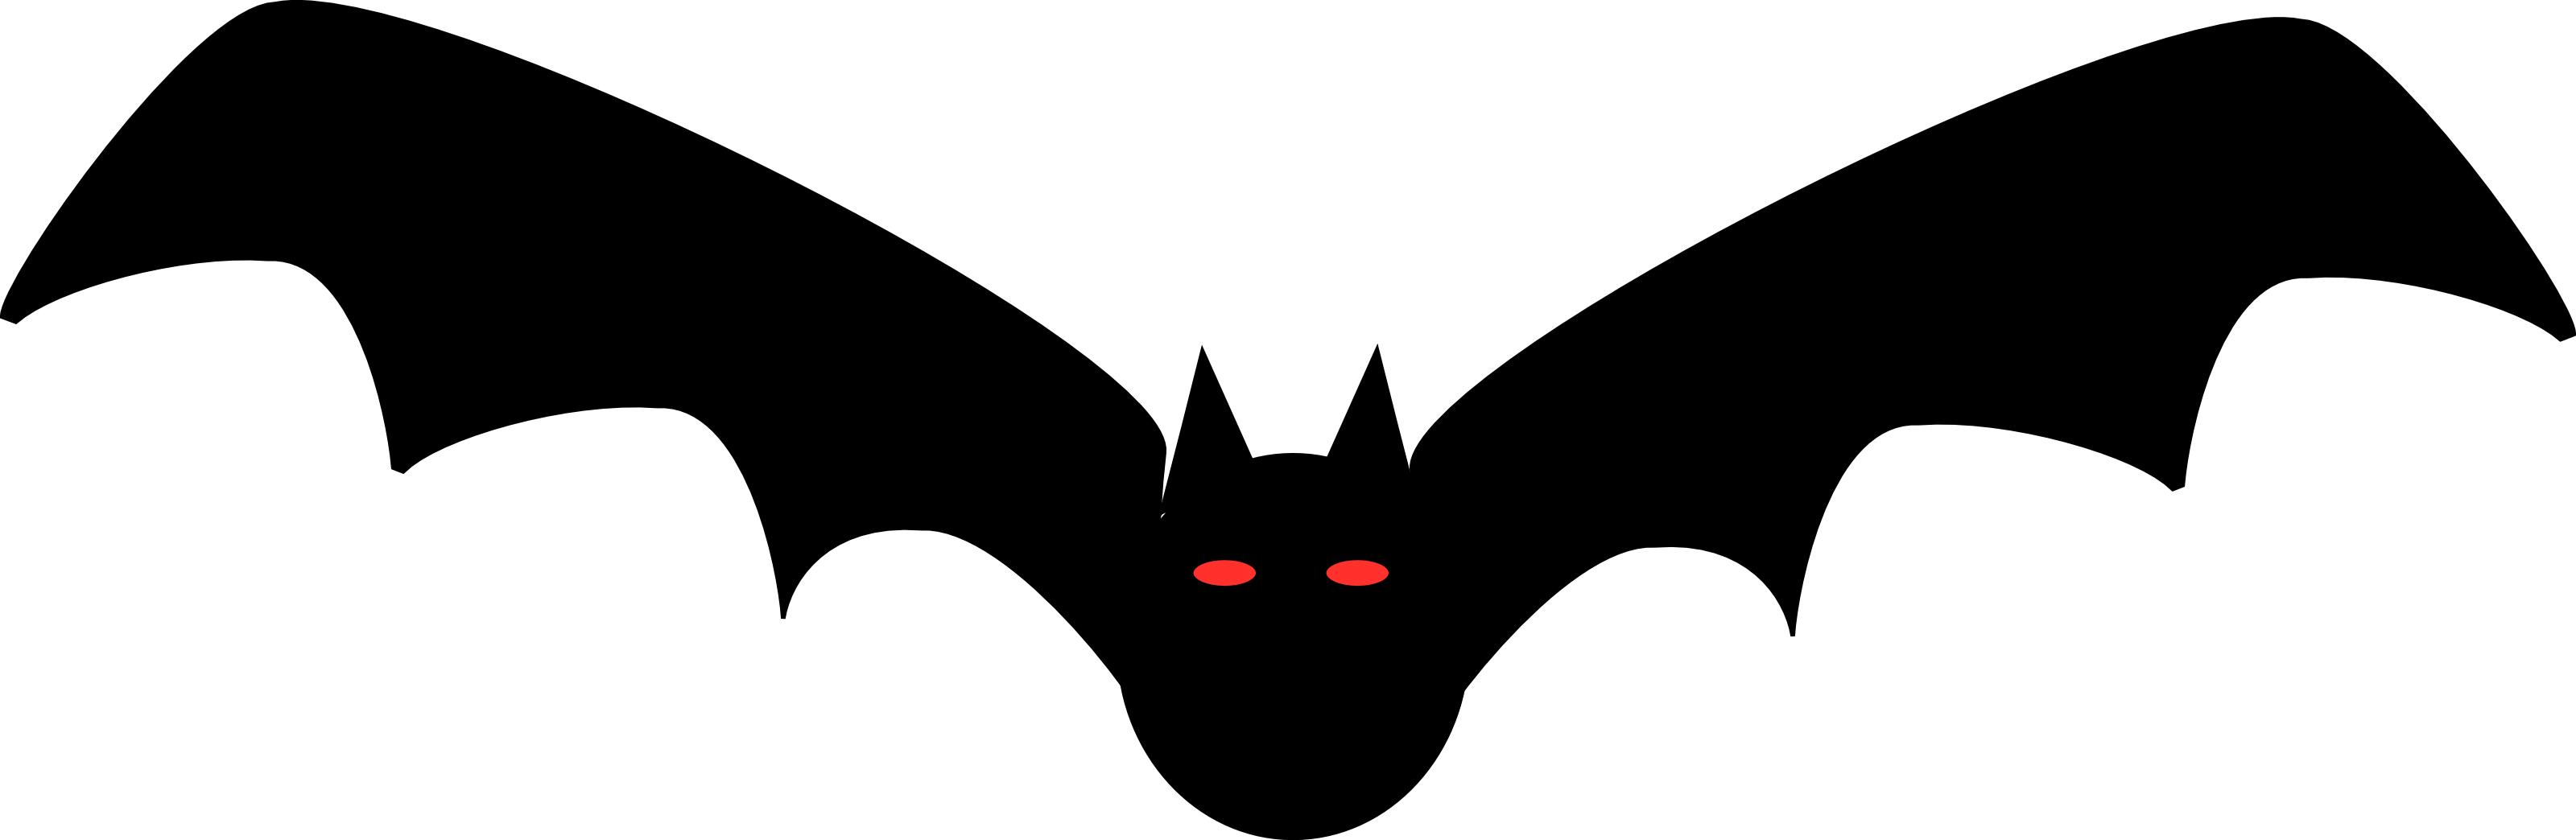 Bat clipart clear background. Batting eyes